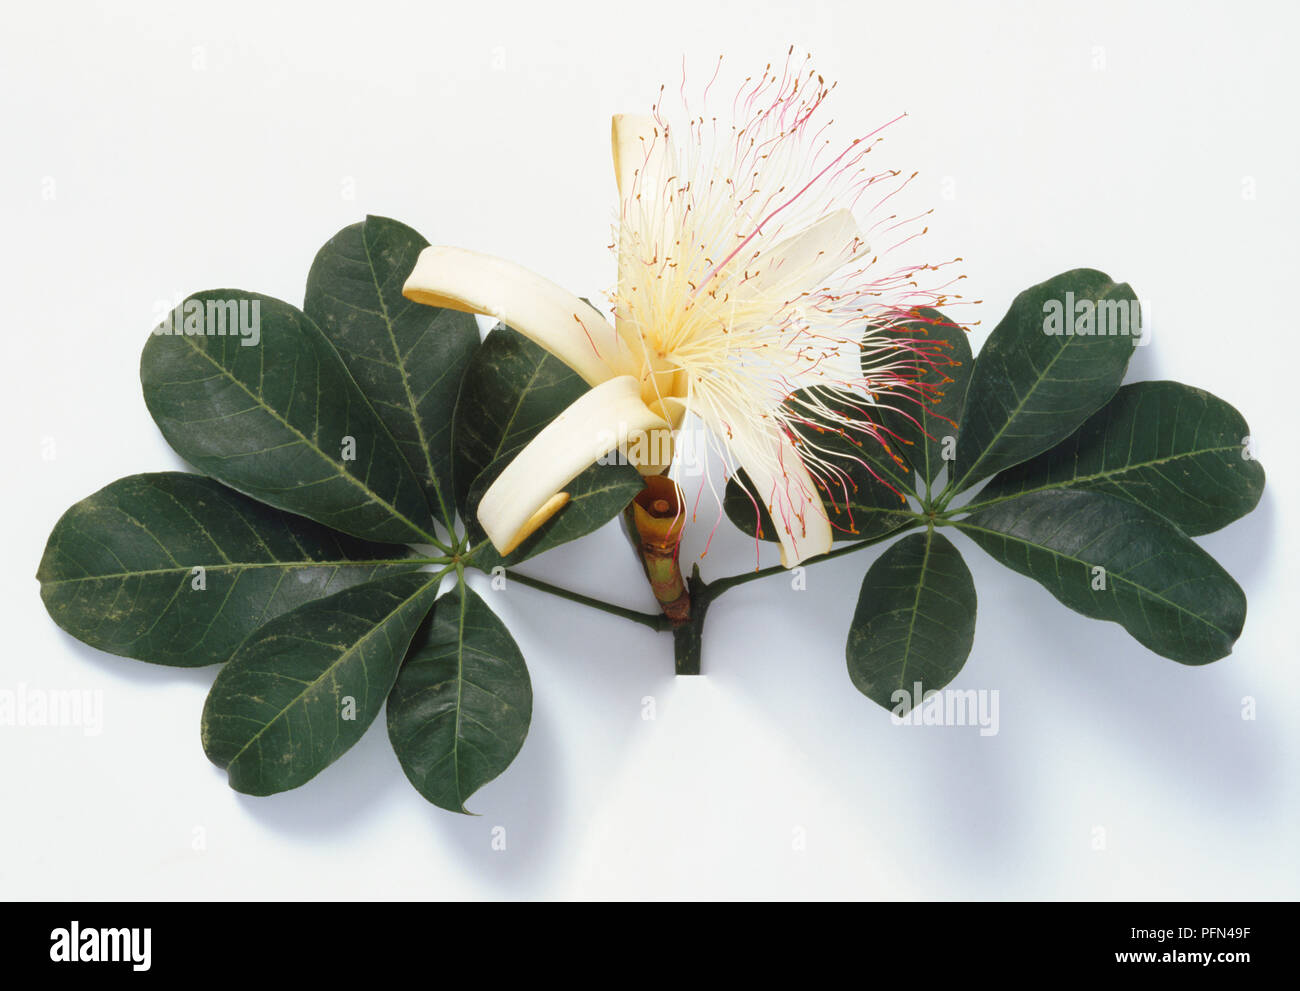 Kapok Flower Stock Photos & Kapok Flower Stock Images - Page 2 - Alamy